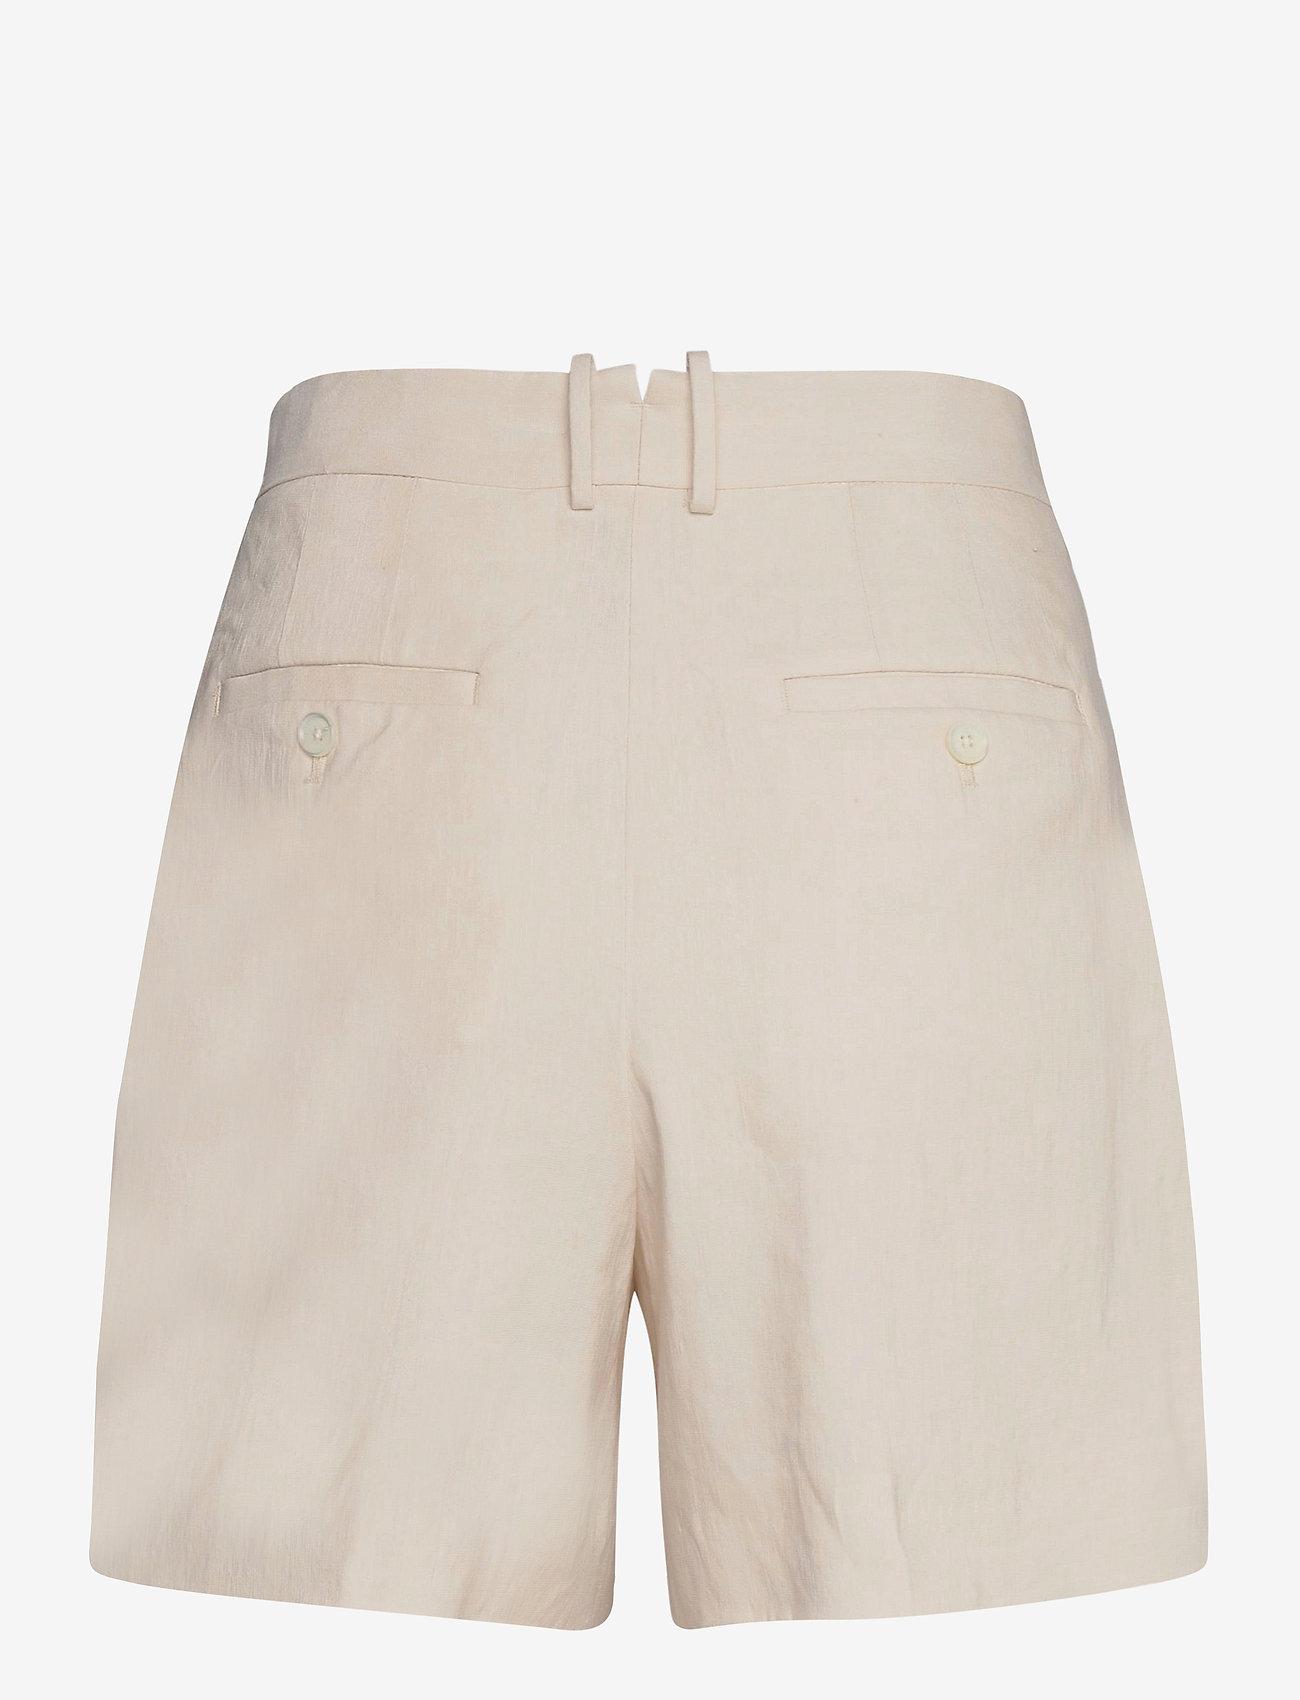 GANT - D2. STRETCH LINEN SHORTS - chino shorts - putty - 1